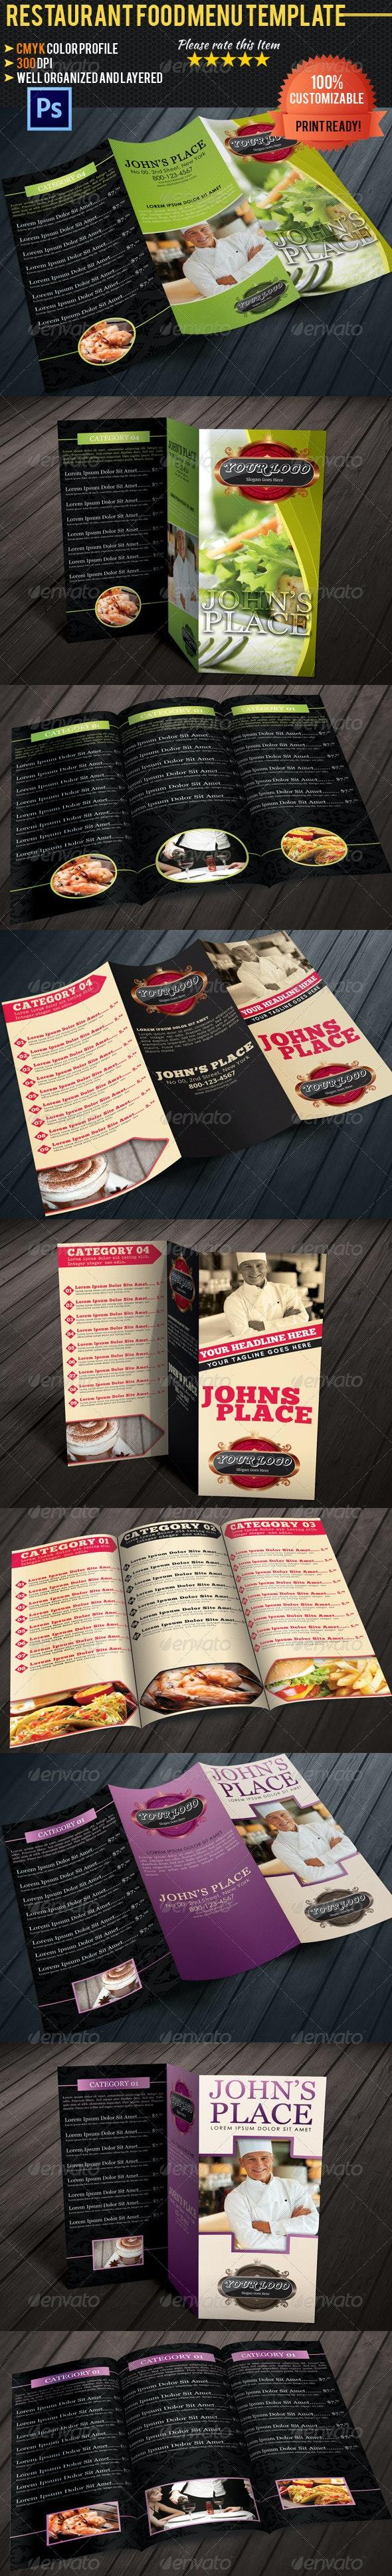 Tri-fold Restaurant Food Menu Template Bundle 02 - Food Menus Print Templates